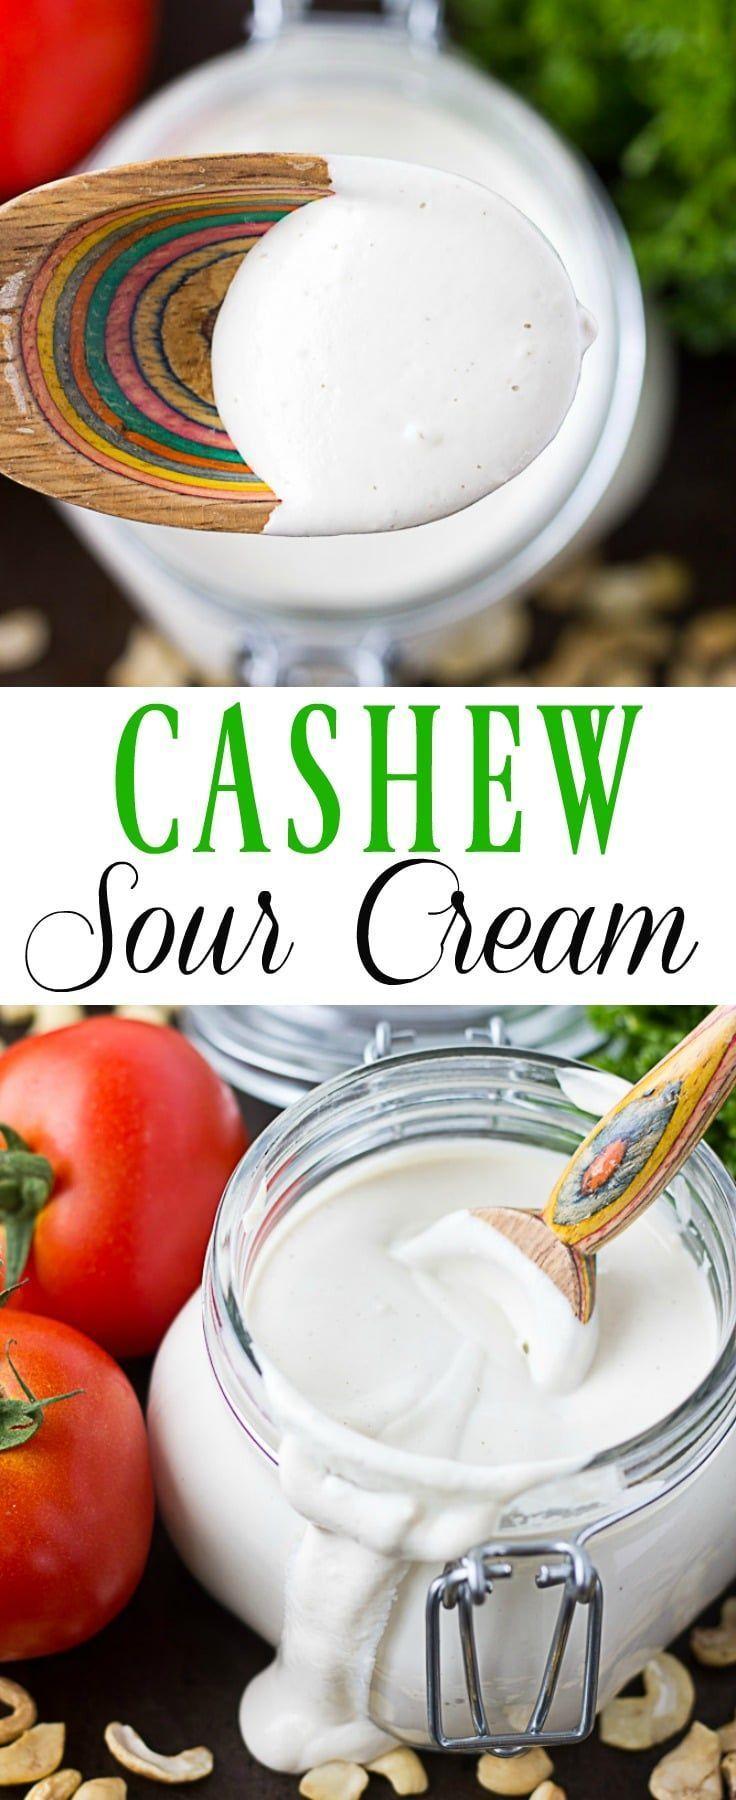 Cashew Sour Cream- a staple vegan recipe. The perfect amount of Sour Cream- a staple vegan recipe. The perfect amount of